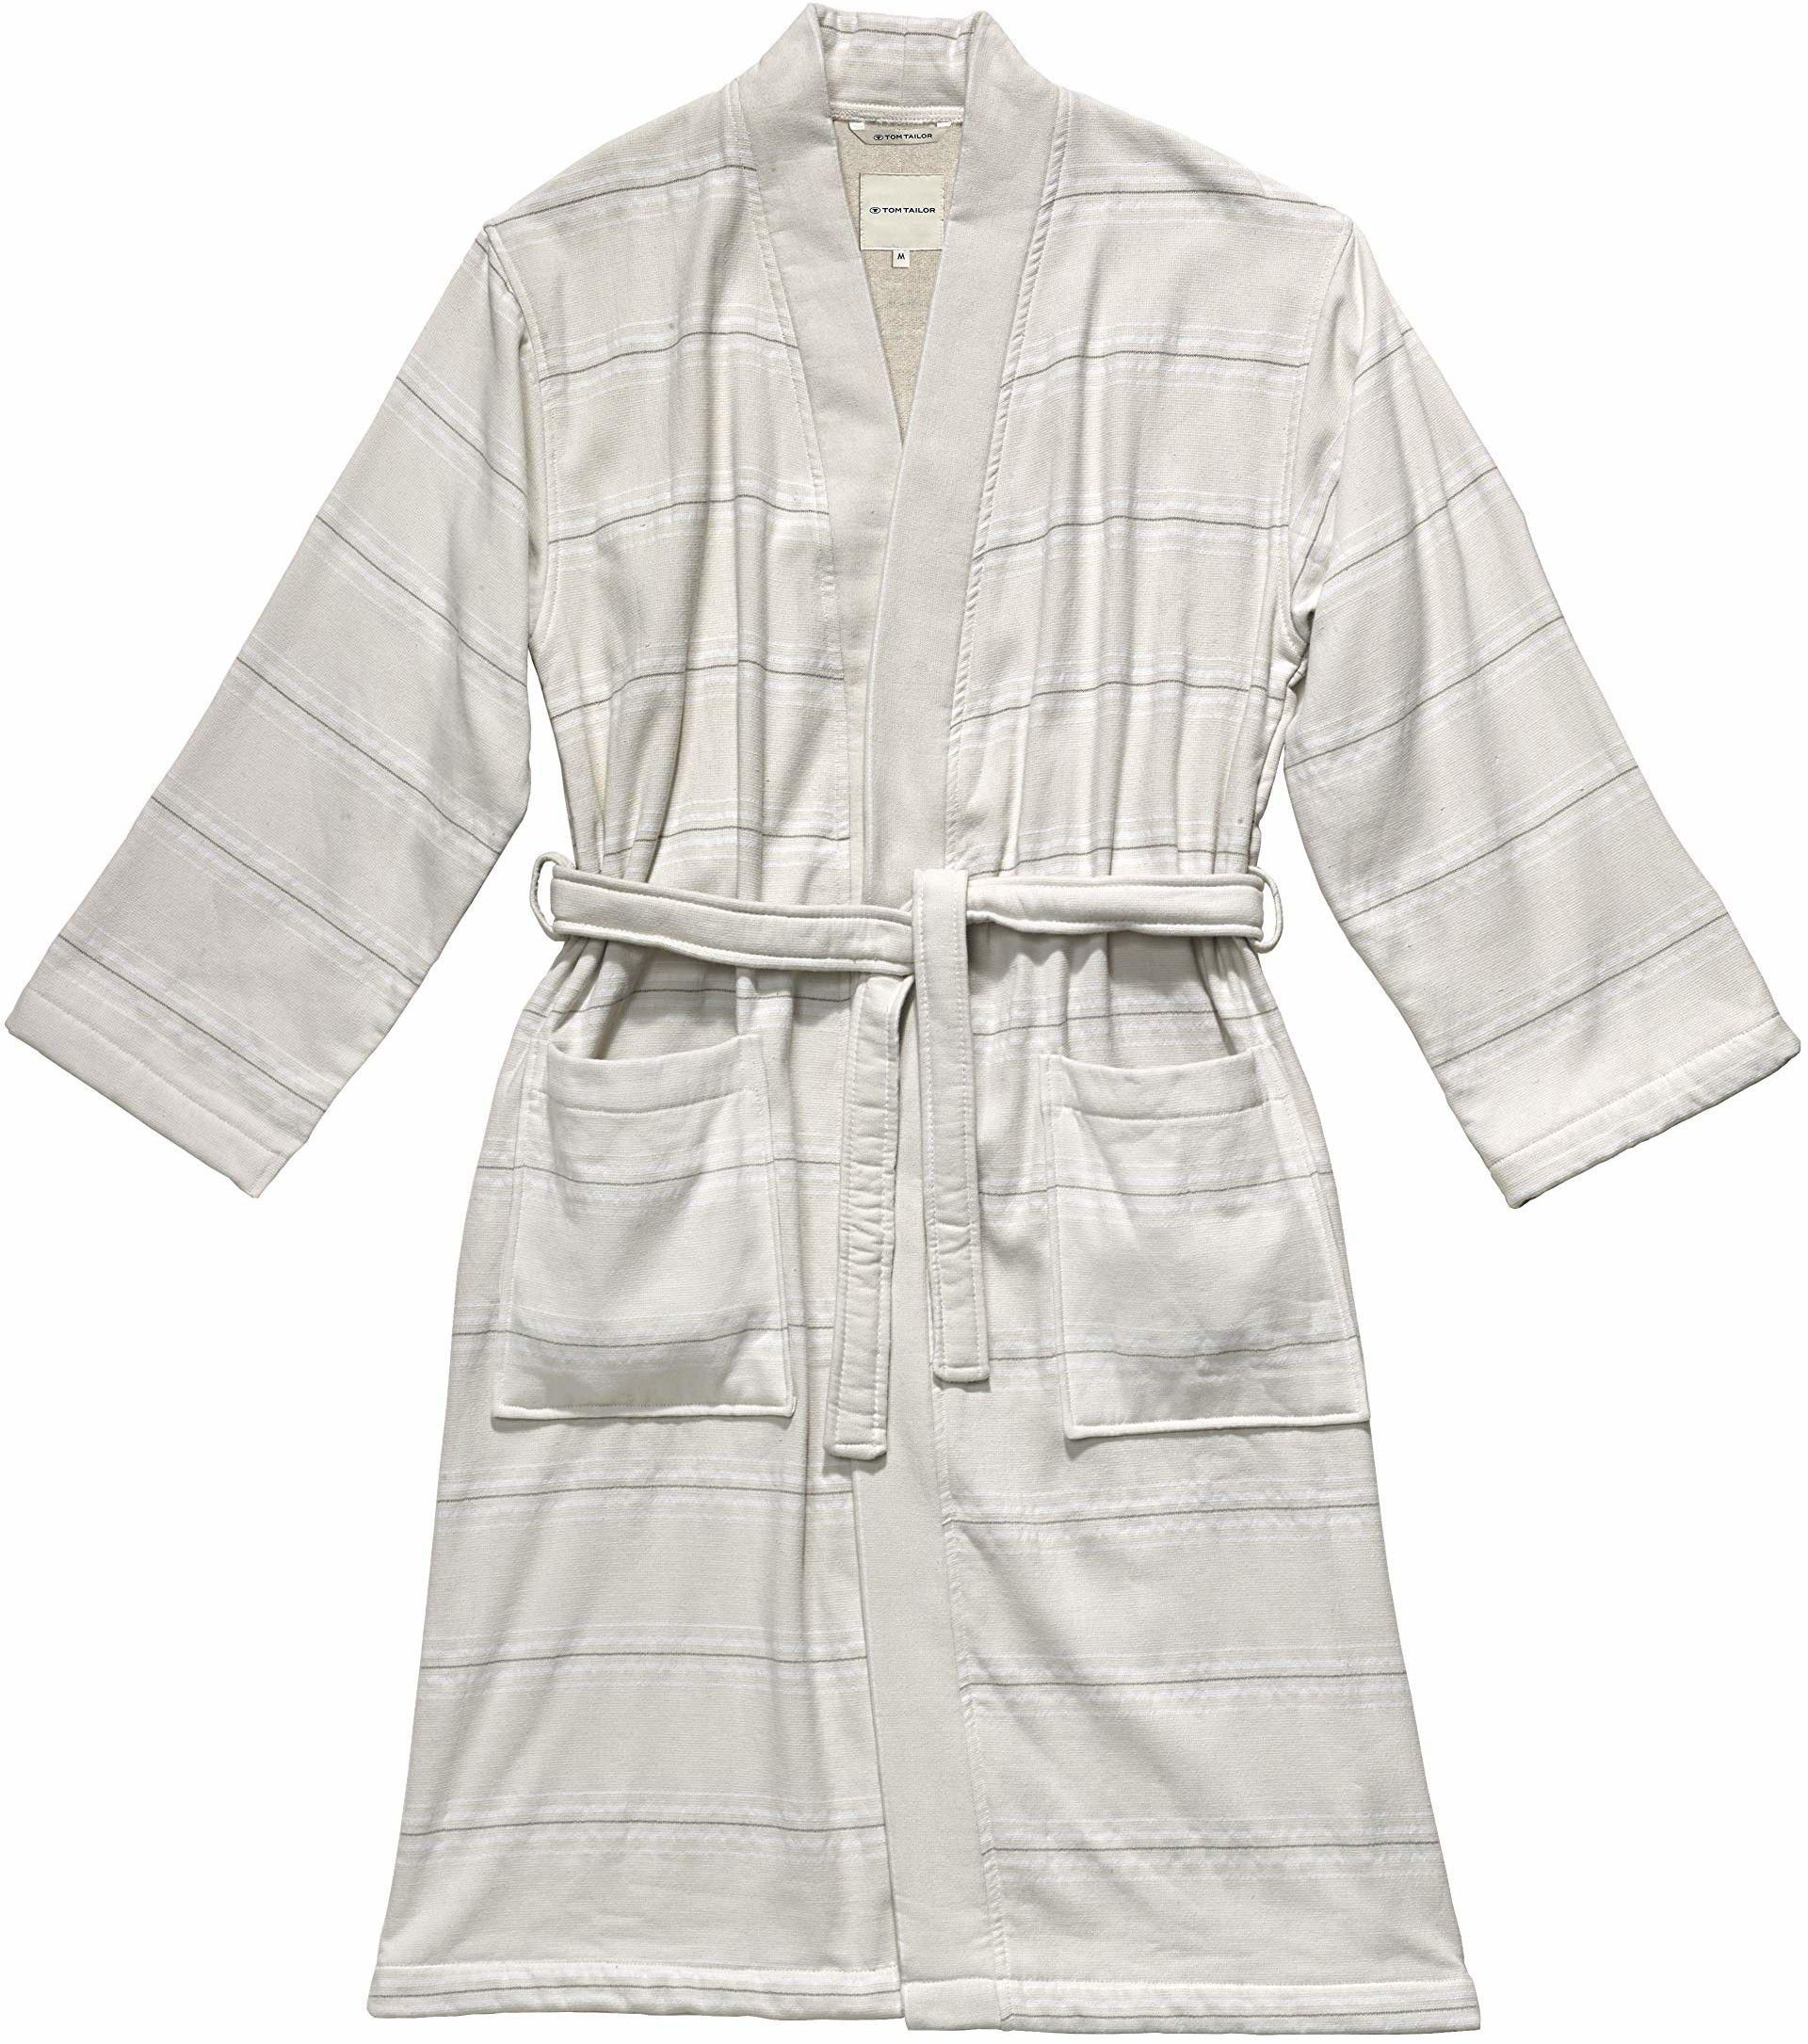 TOM TAILOR 0100509 szlafrok Wellness Kimono, piasek, M